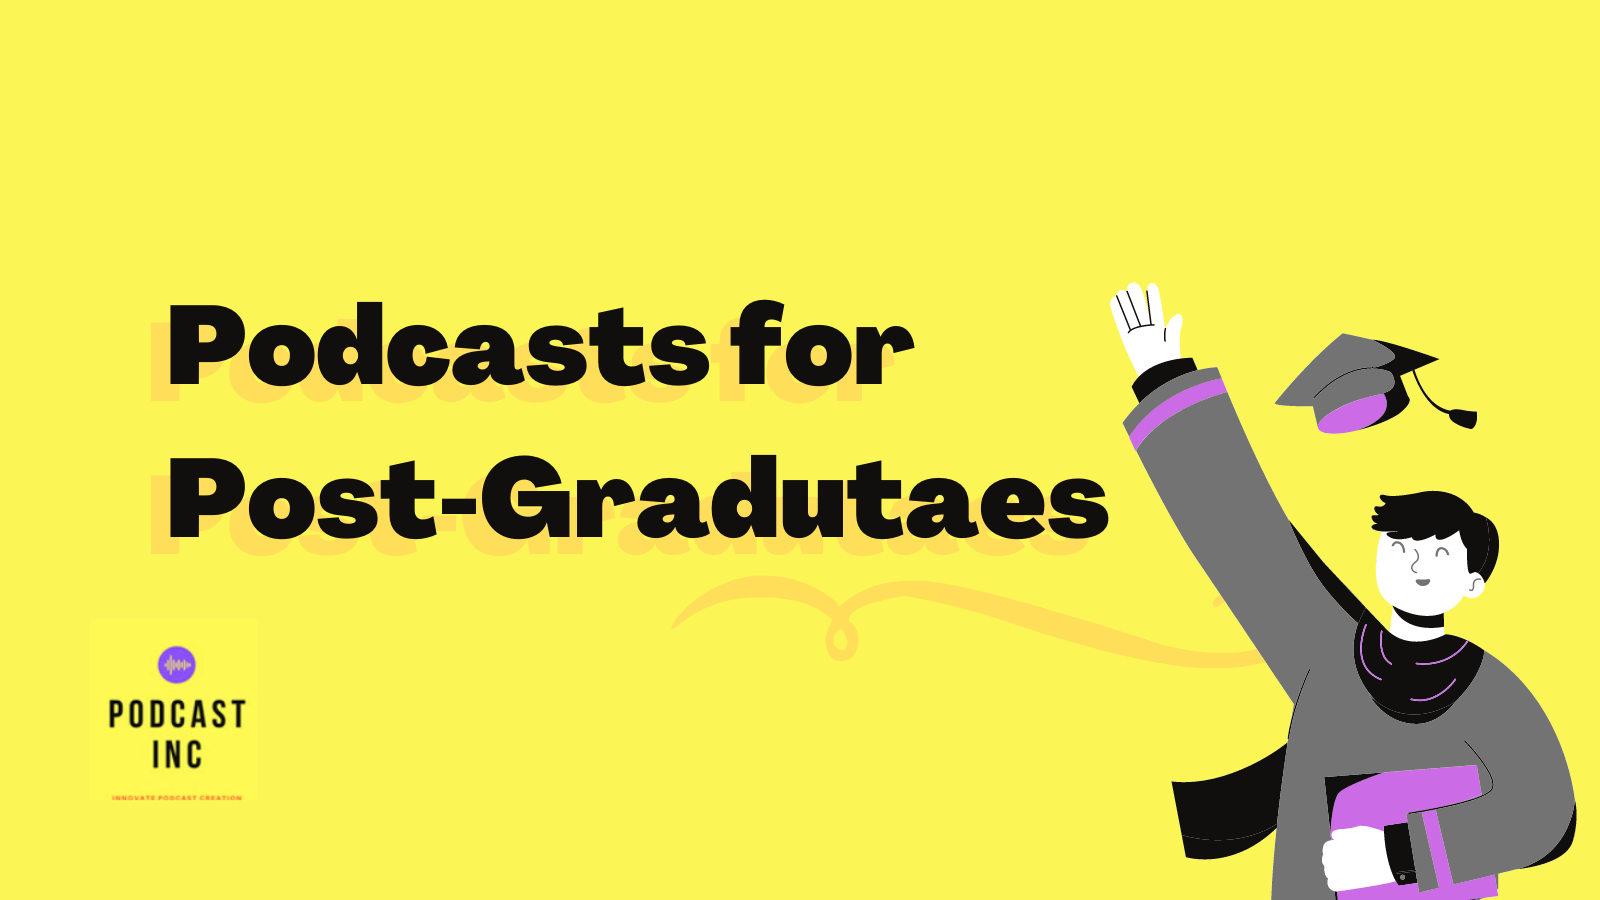 Podcasts for Postgraduates!